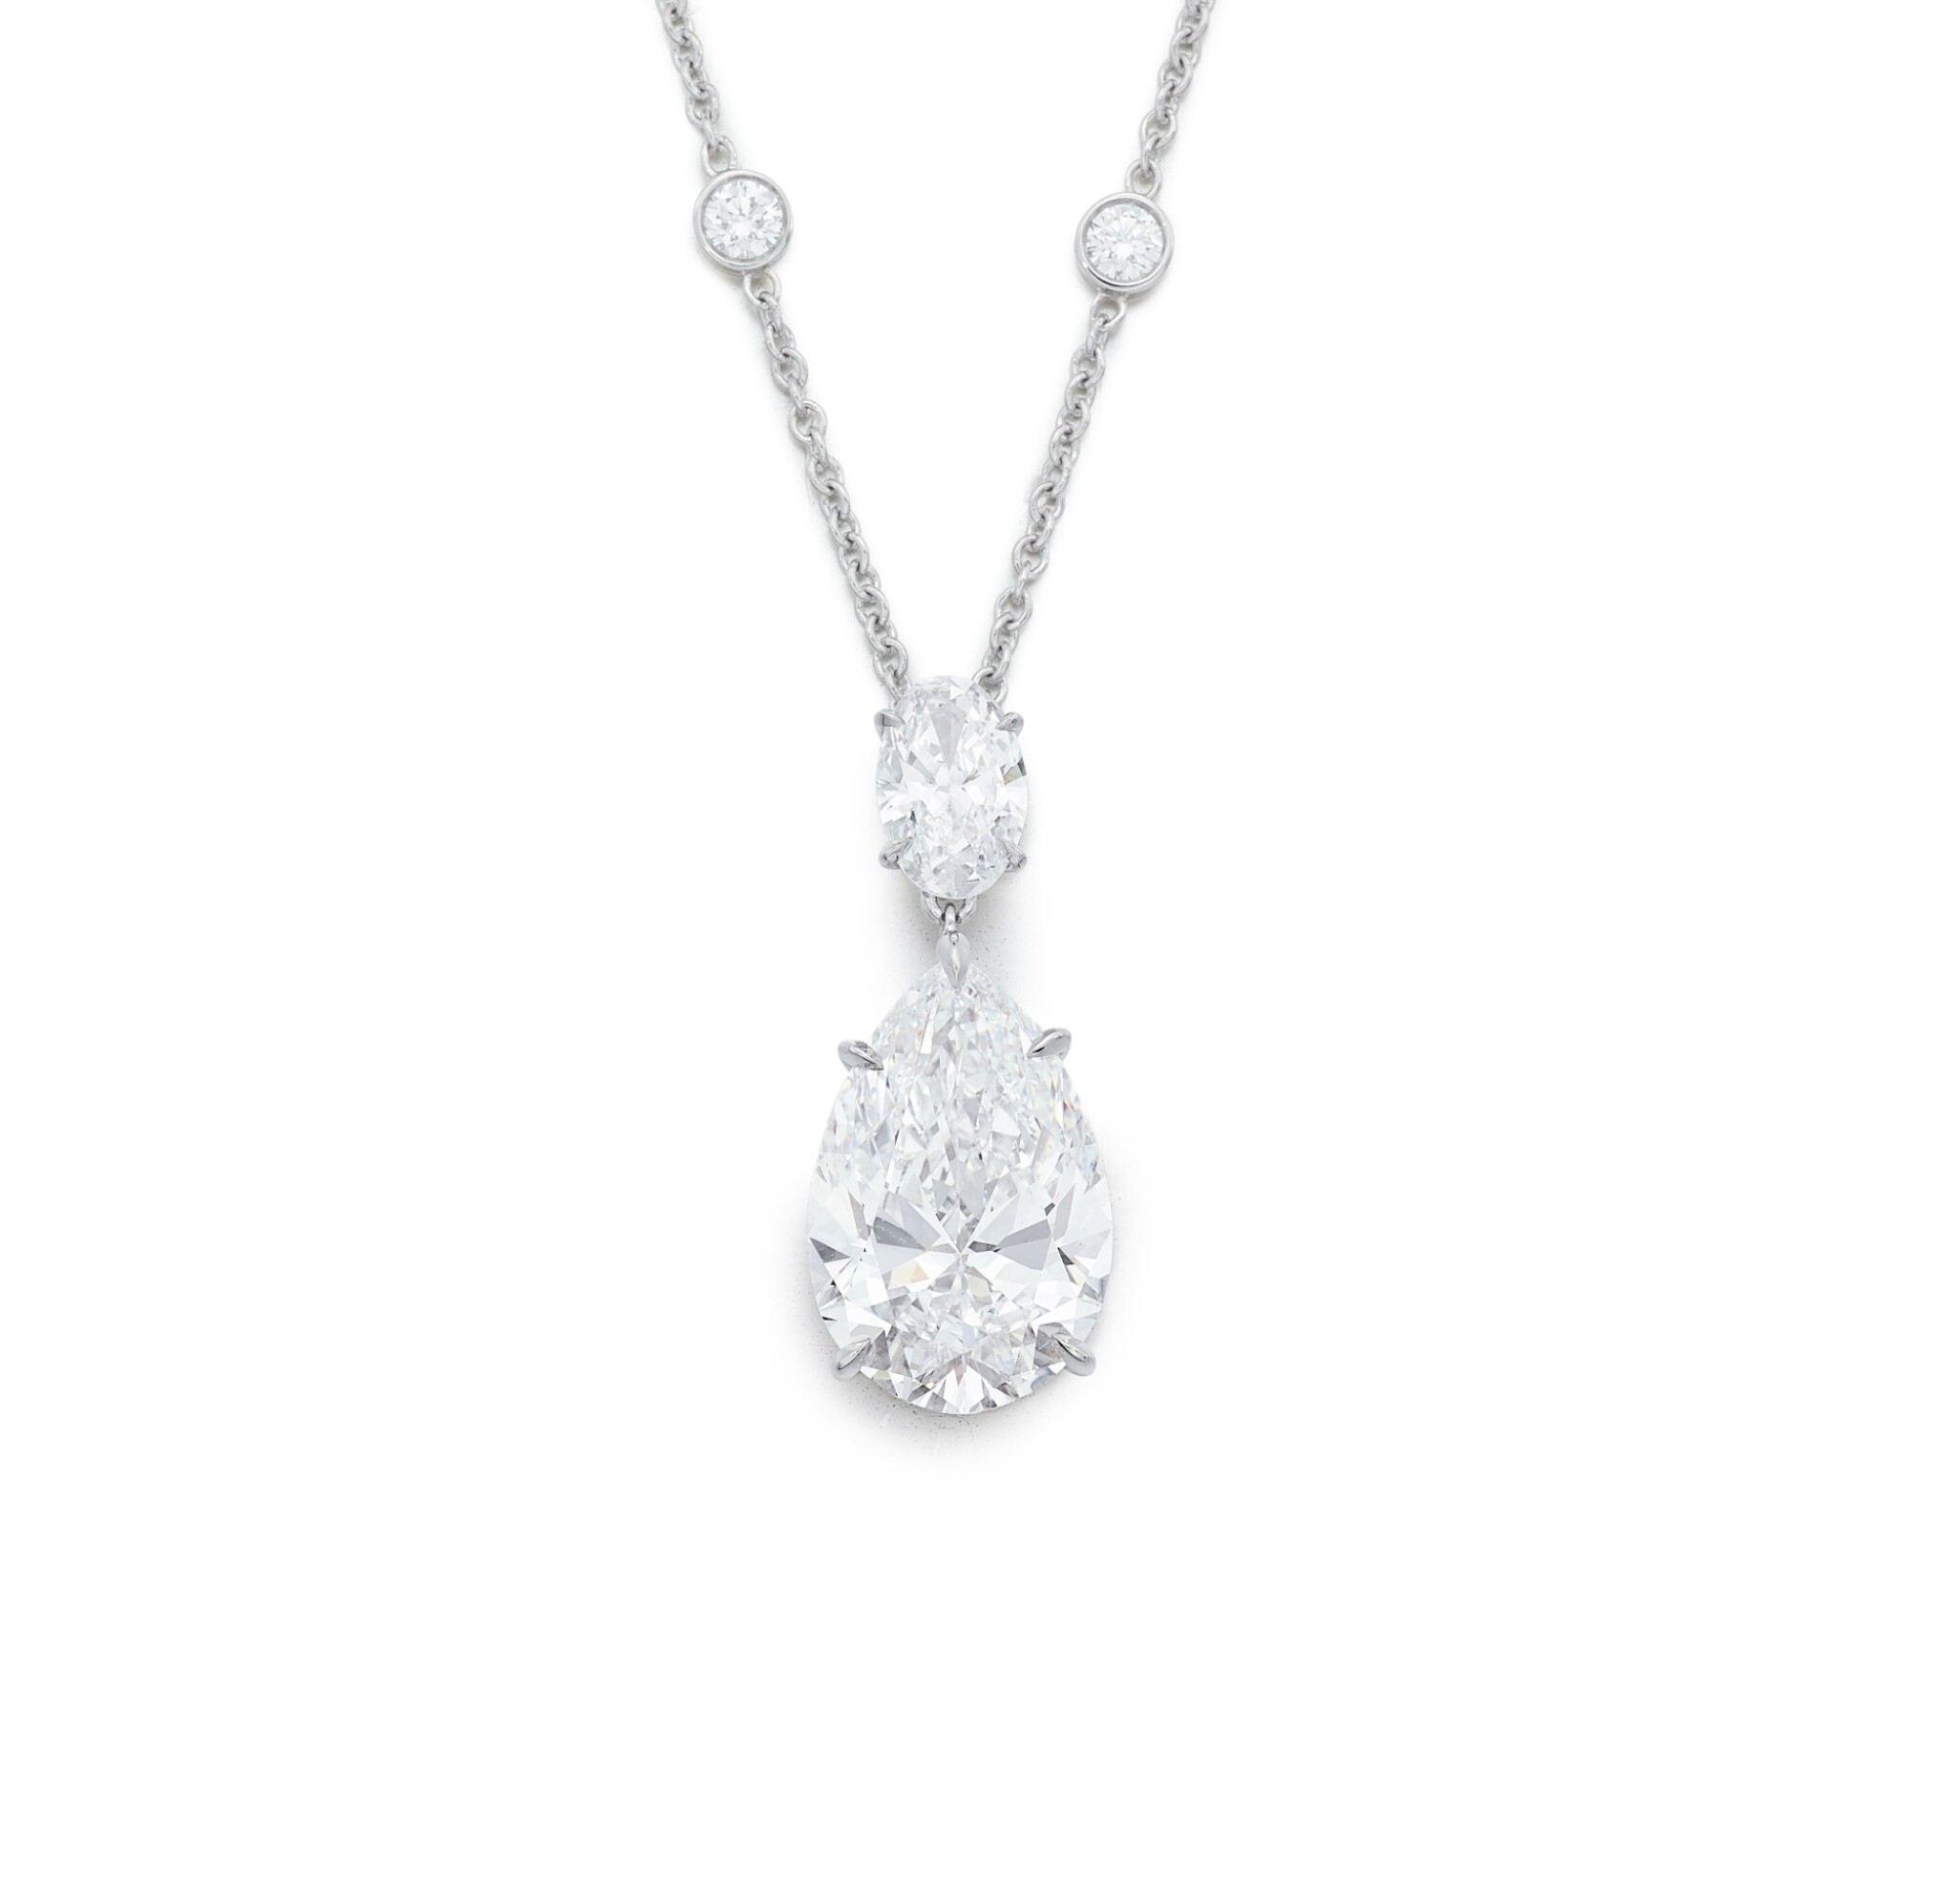 View full screen - View 1 of Lot 1715. Diamond Necklace   蒂芙尼   10.01克拉 梨形 D色 完美無暇 鑽石 項鏈.